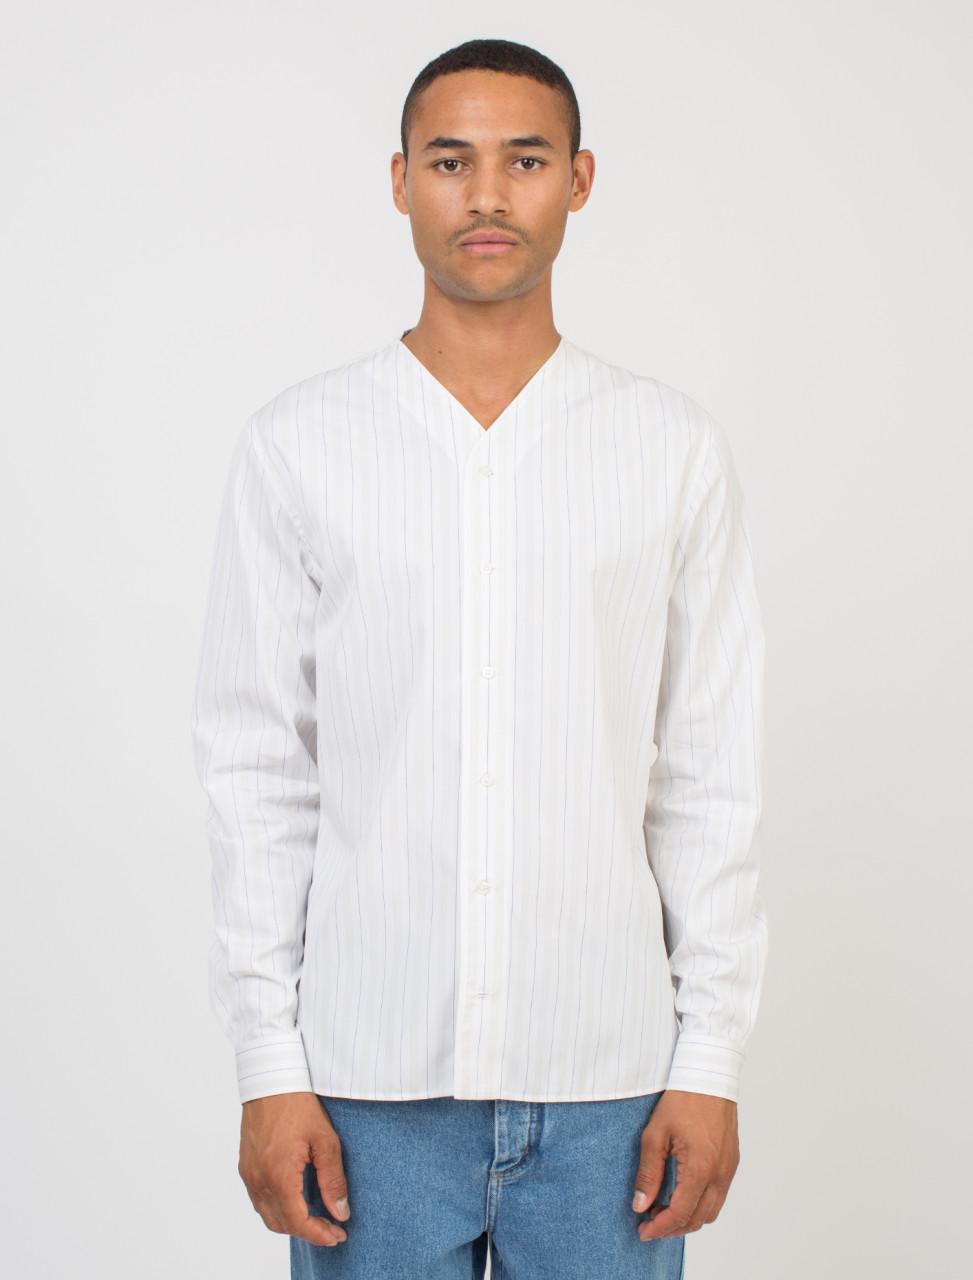 Ribes FF Shirt